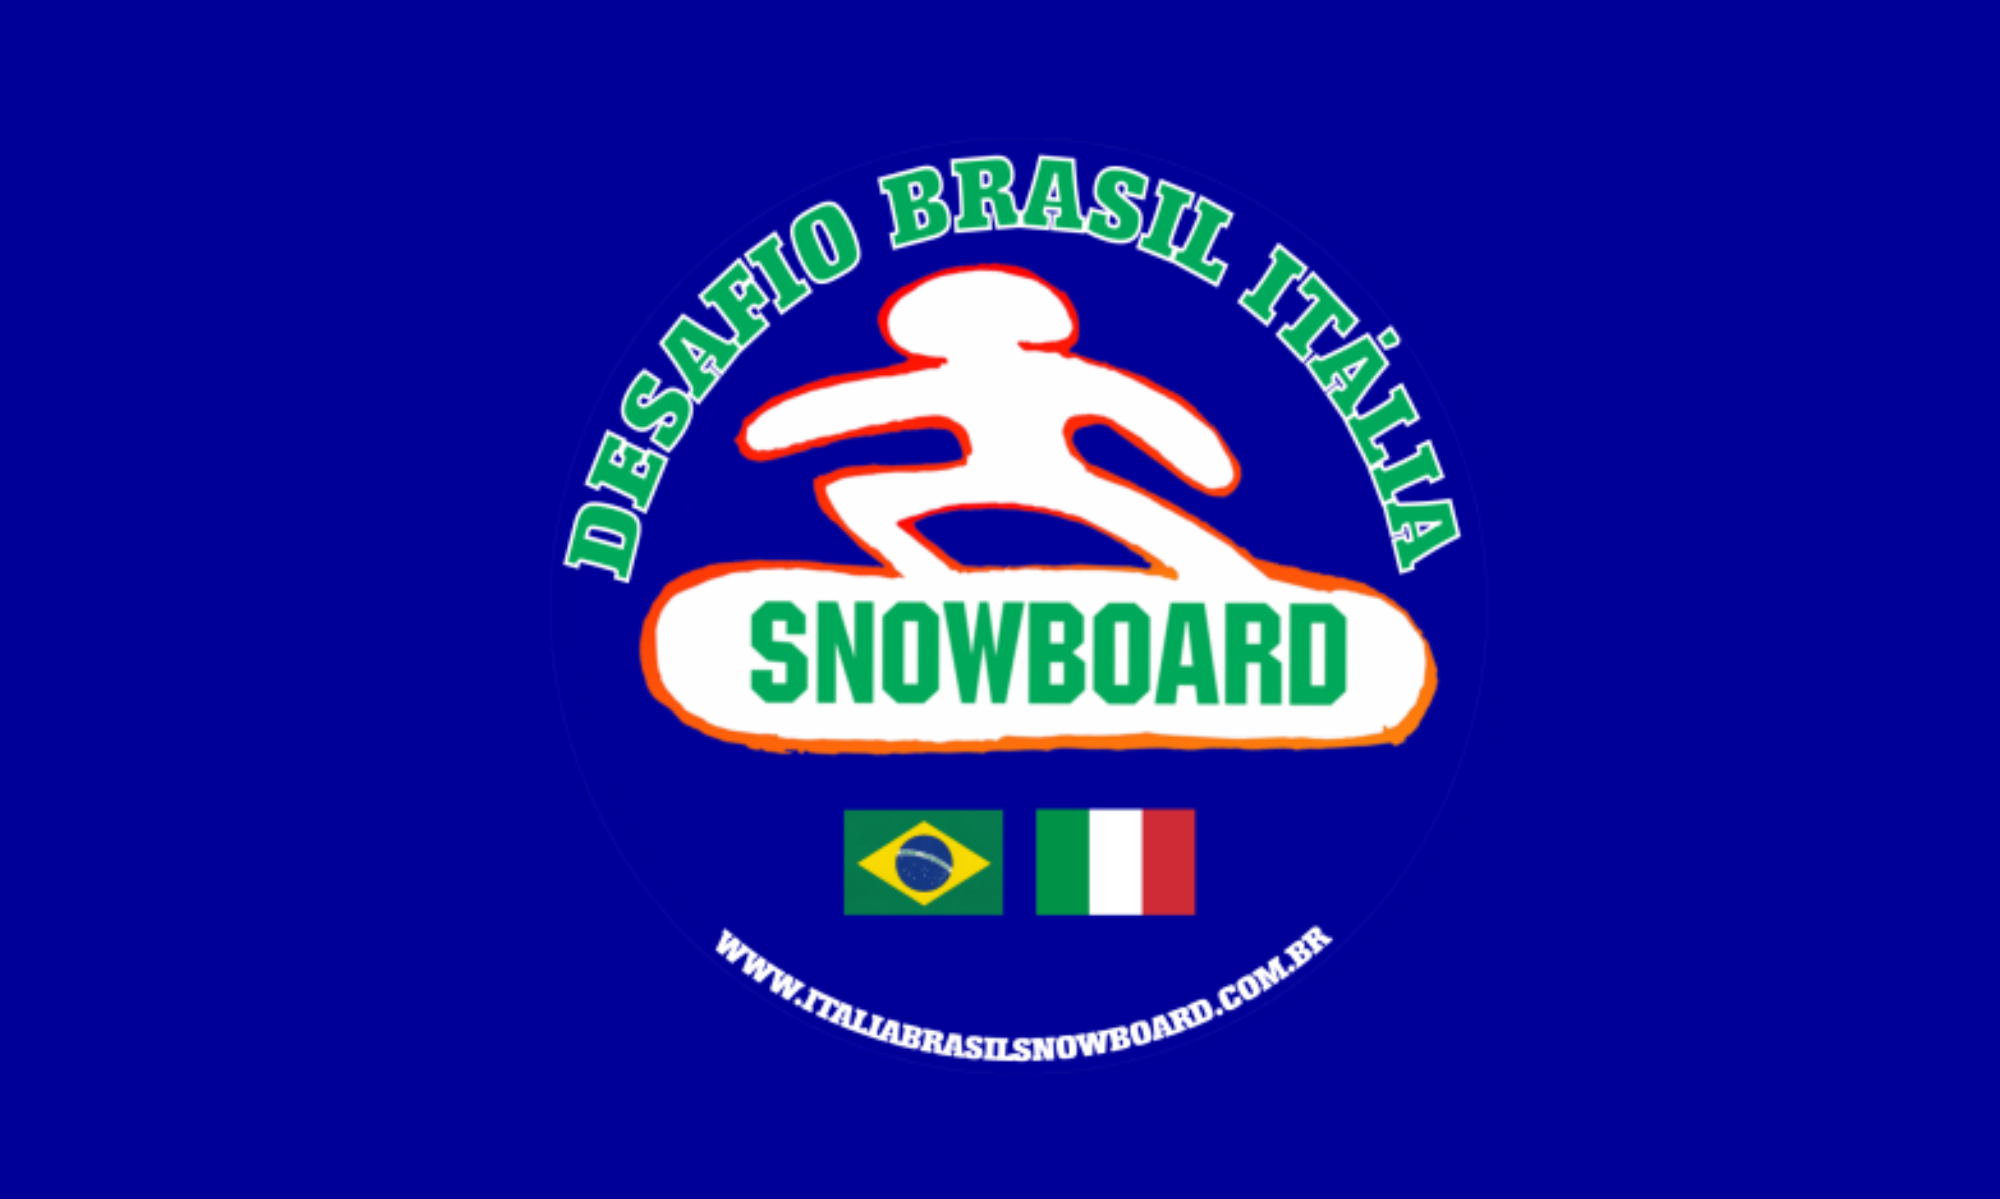 Desafio Itália Brasil de Snowboard